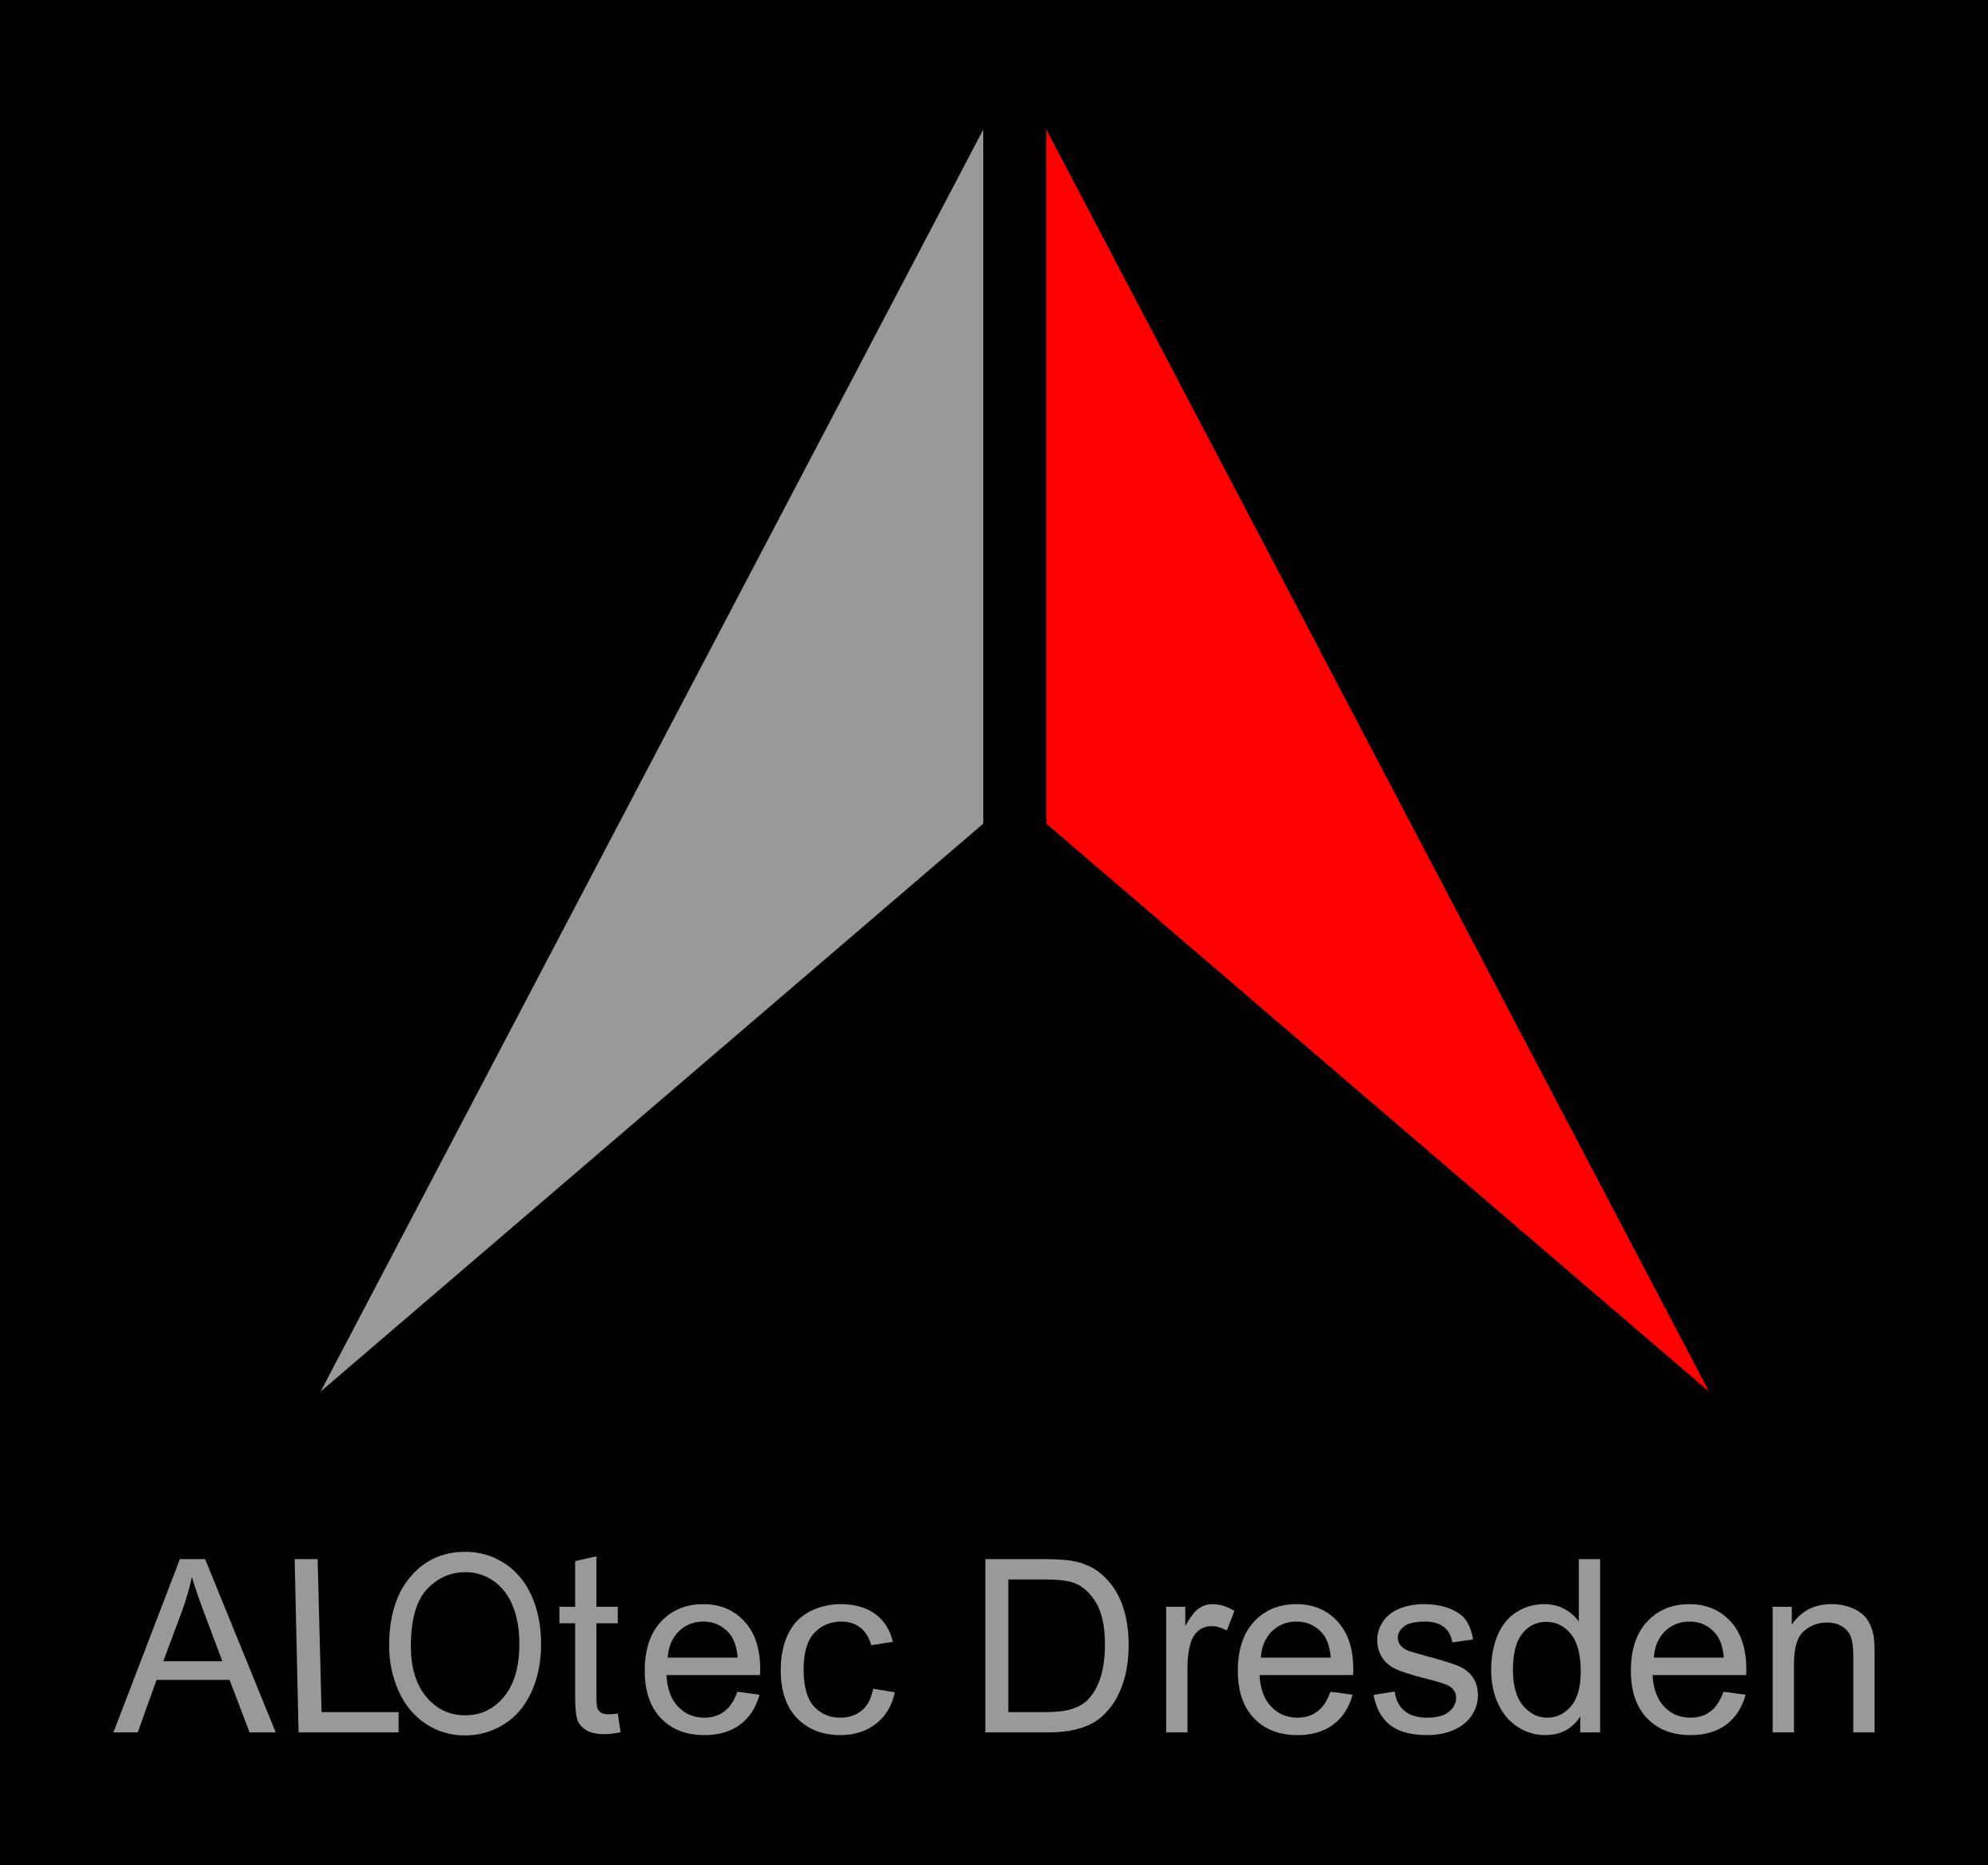 ALOtec Dresden GmbH